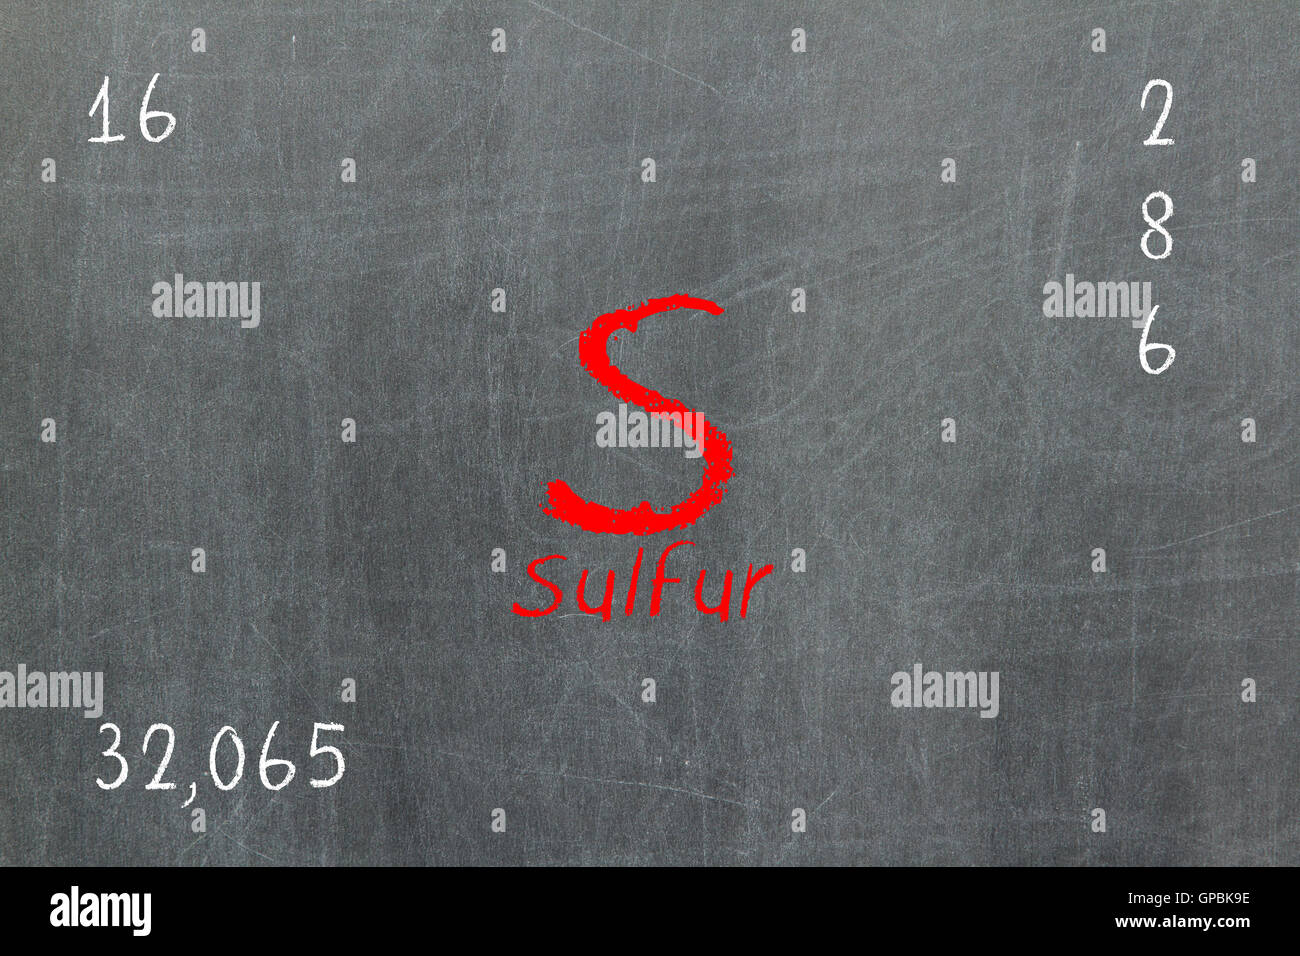 Isolated blackboard with periodic table sulfur stock photo isolated blackboard with periodic table sulfur gamestrikefo Choice Image